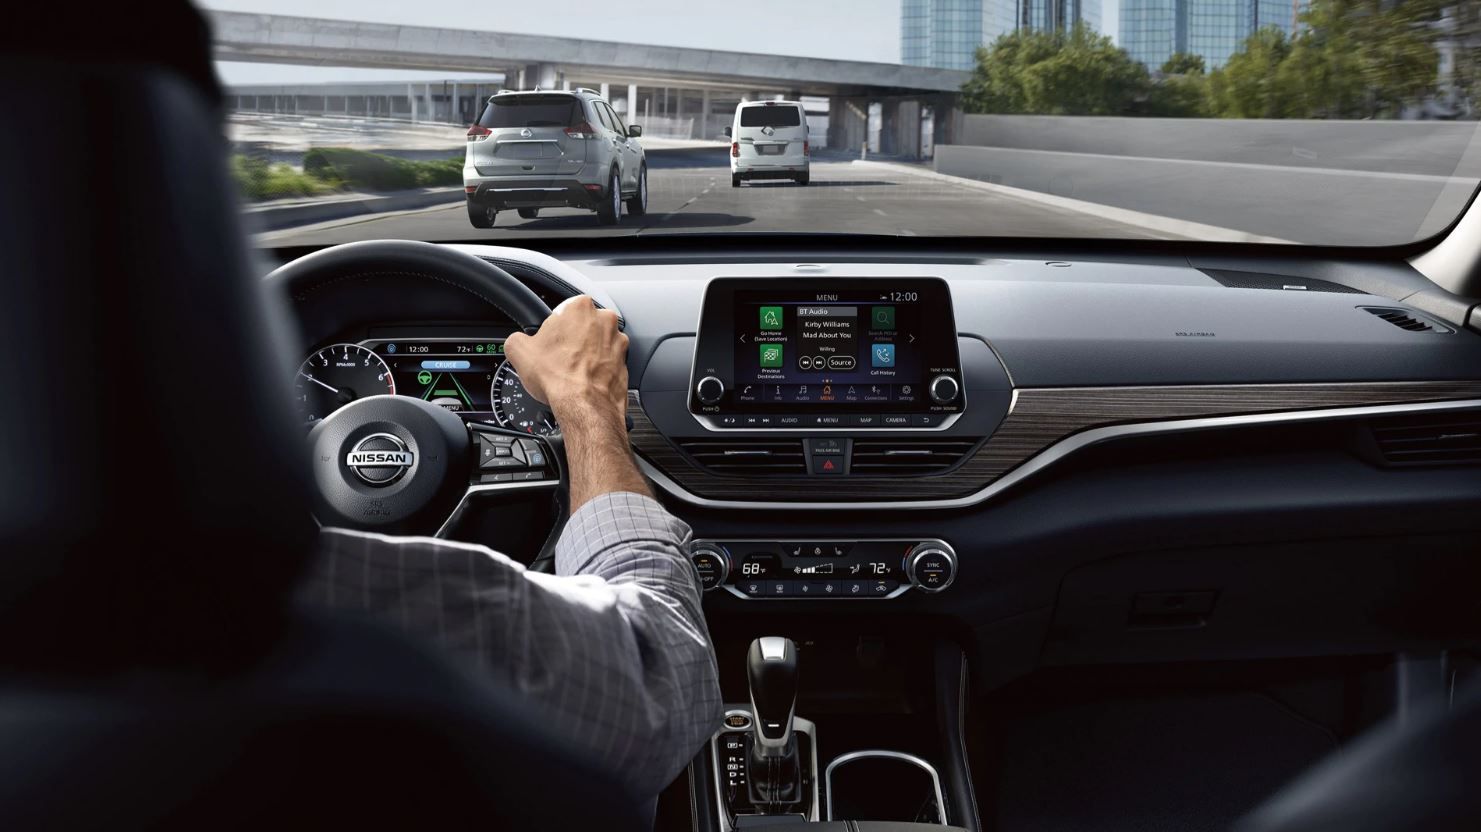 Interior of the 2020 Nissan Altima